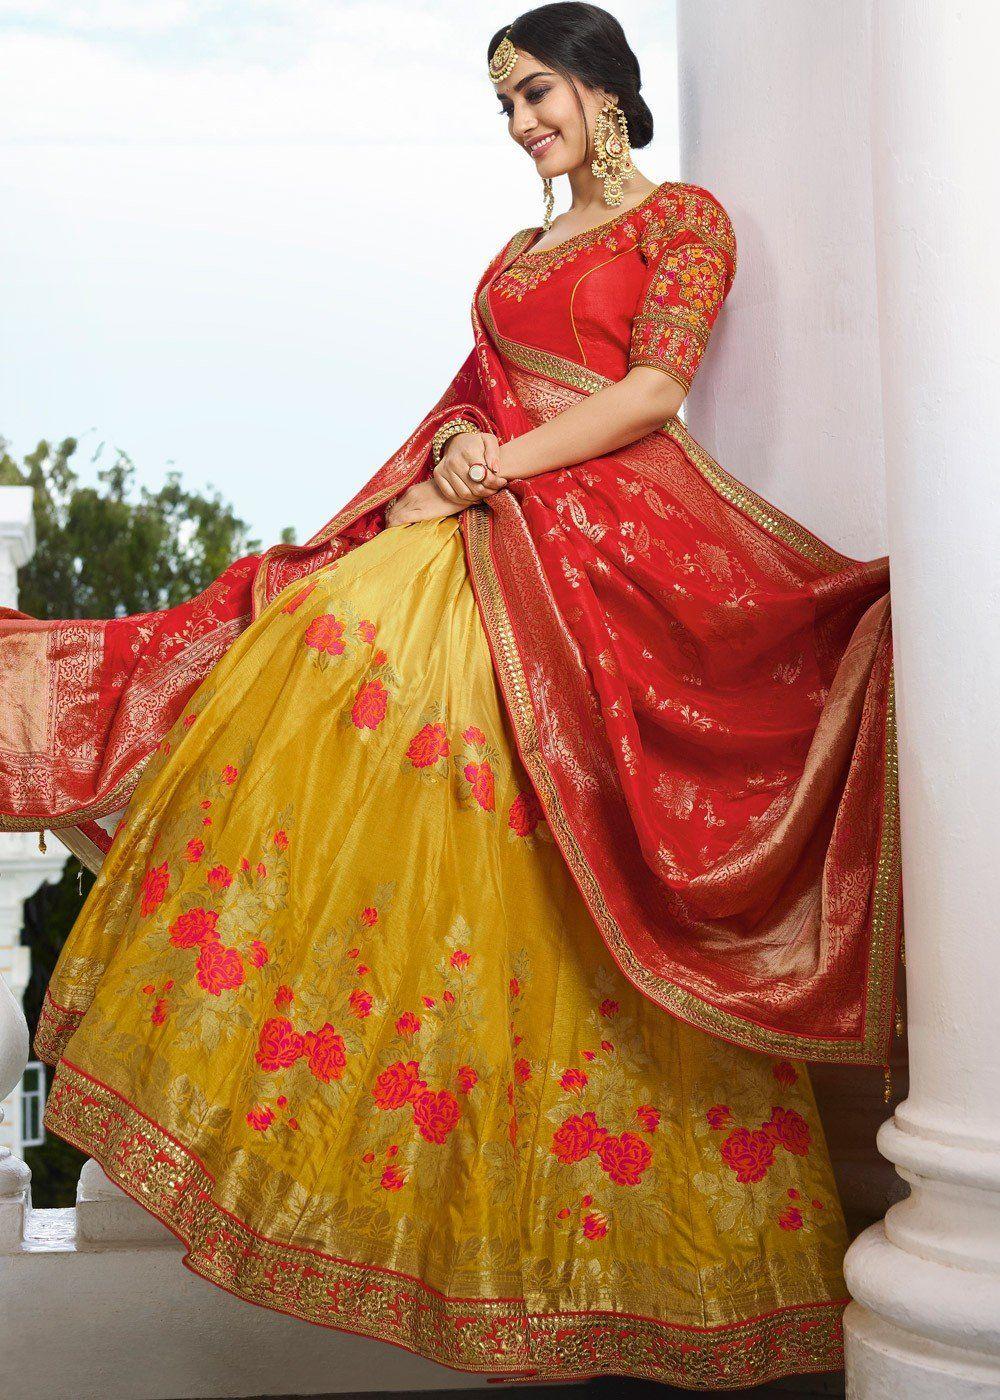 1c4a2307a4 Bride and Baraat Lehenga Choli Collection by Haya Creations ...